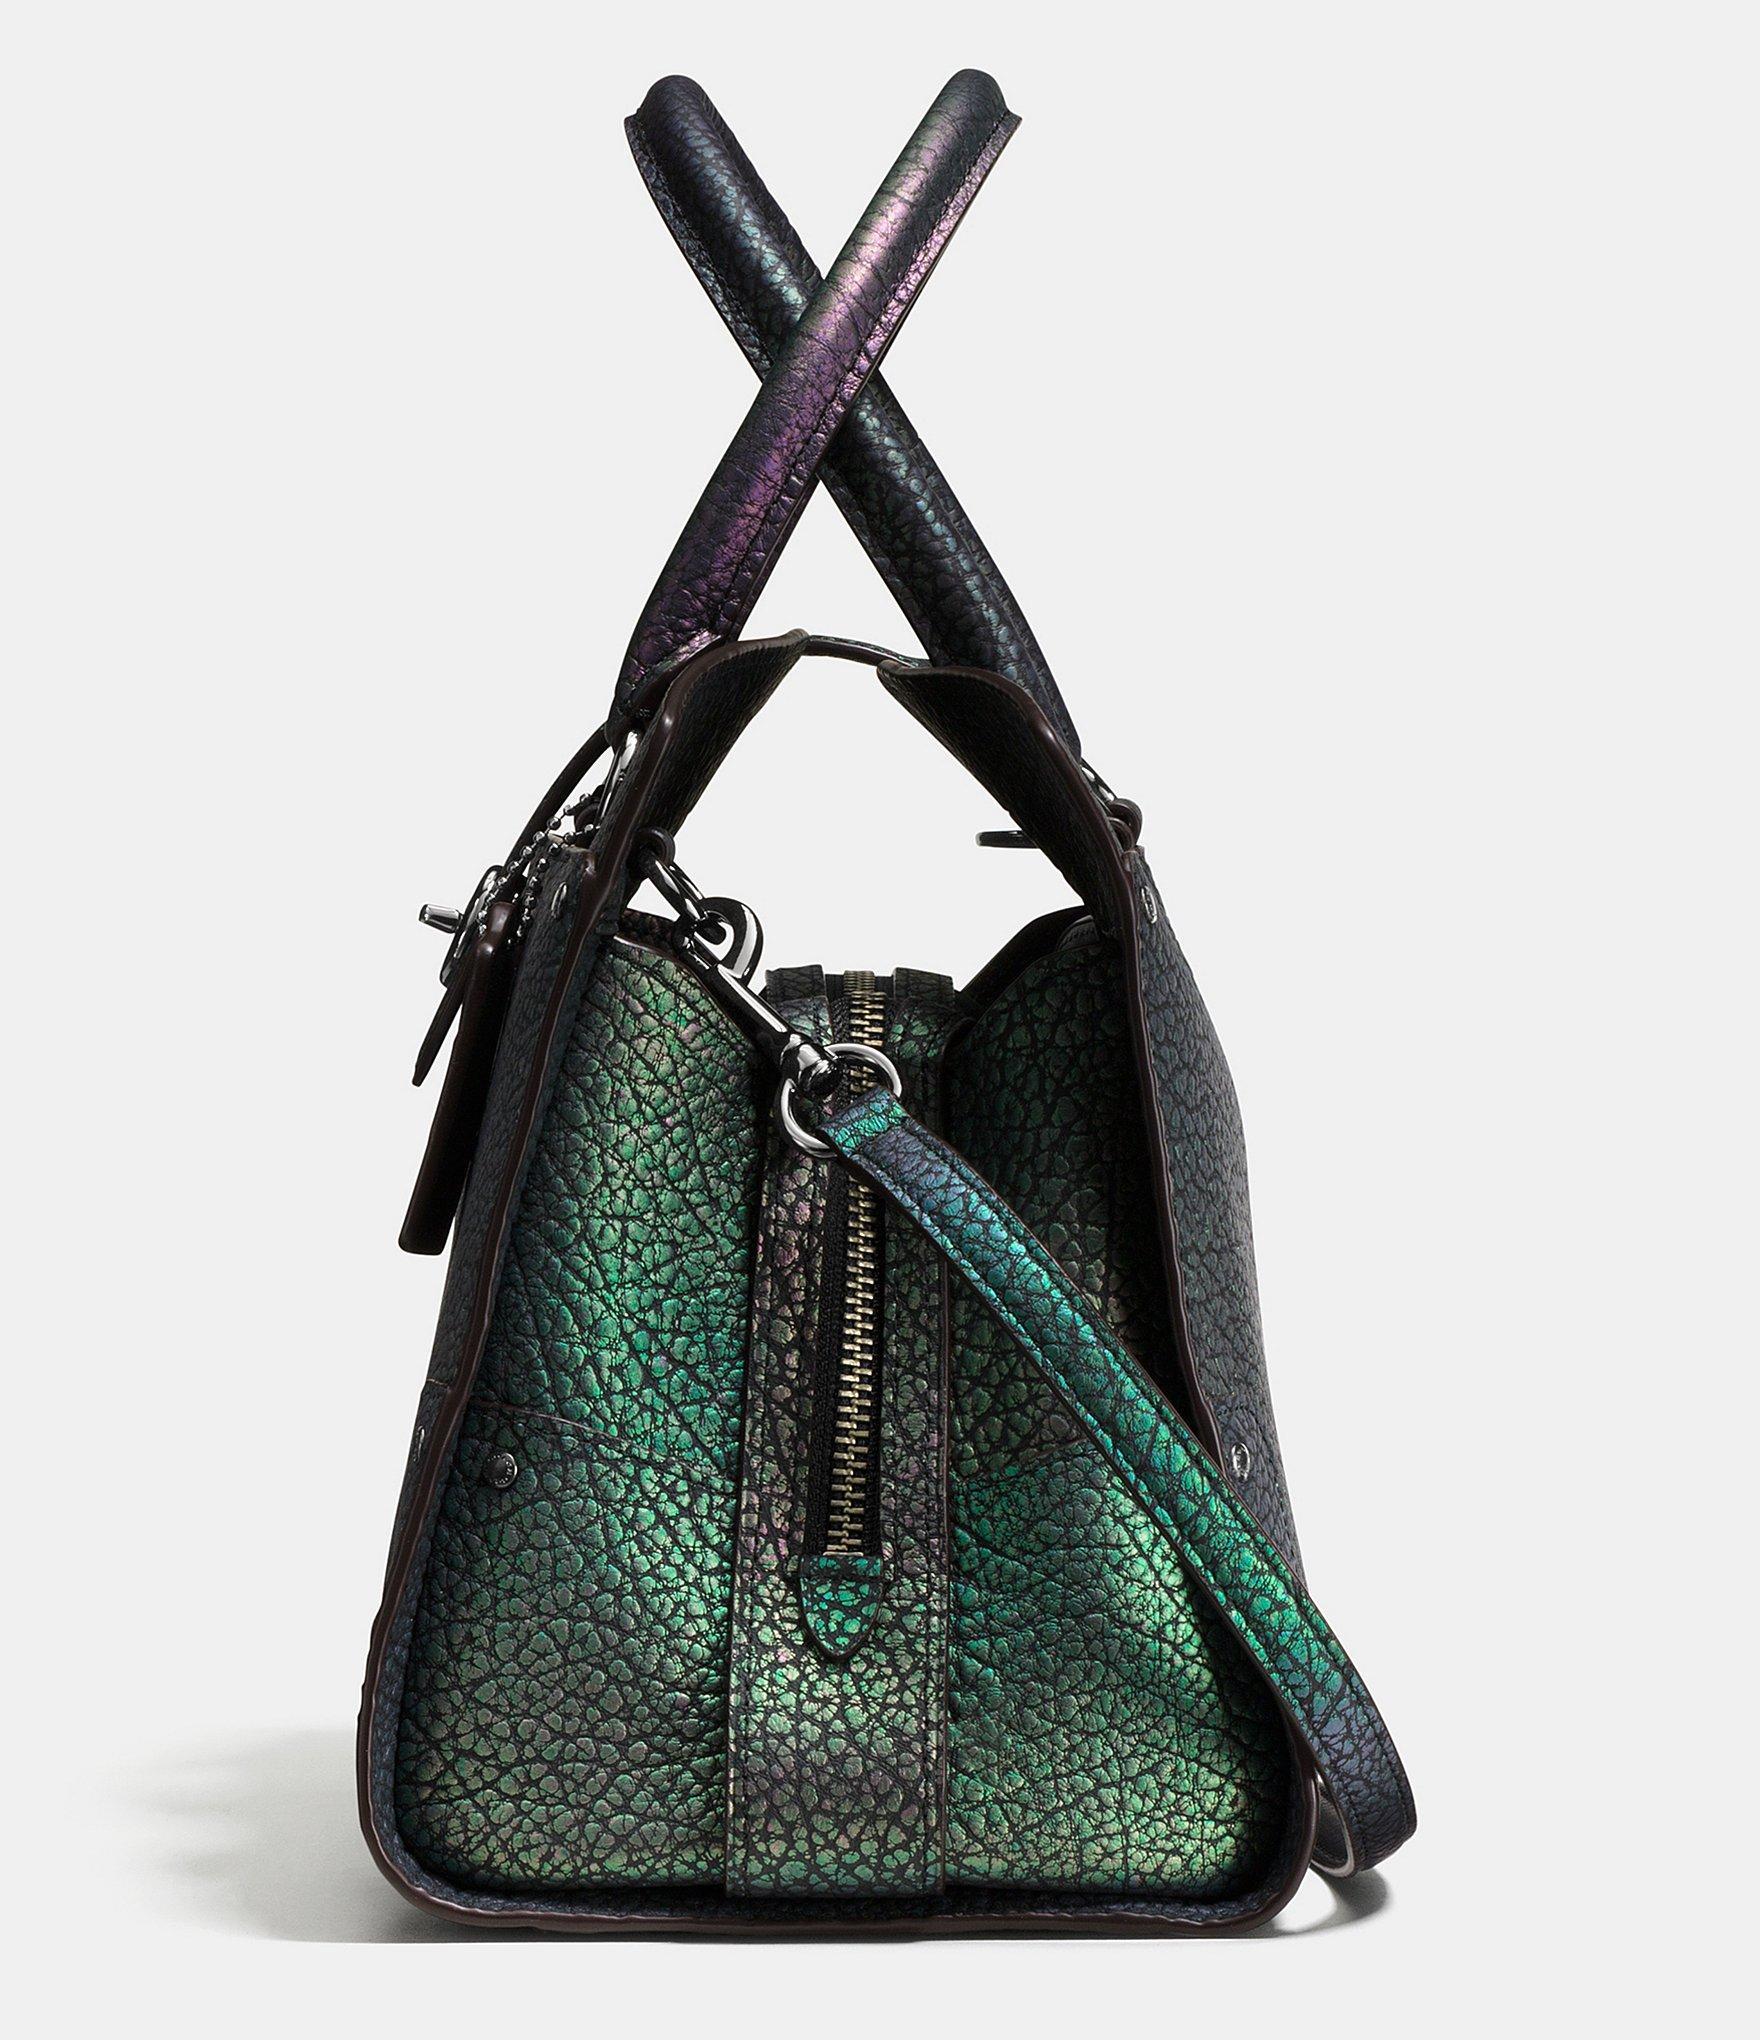 59b8ba8b9 ... official store coach mercer 30 hologram leather satchel lyst a8e2e 80779